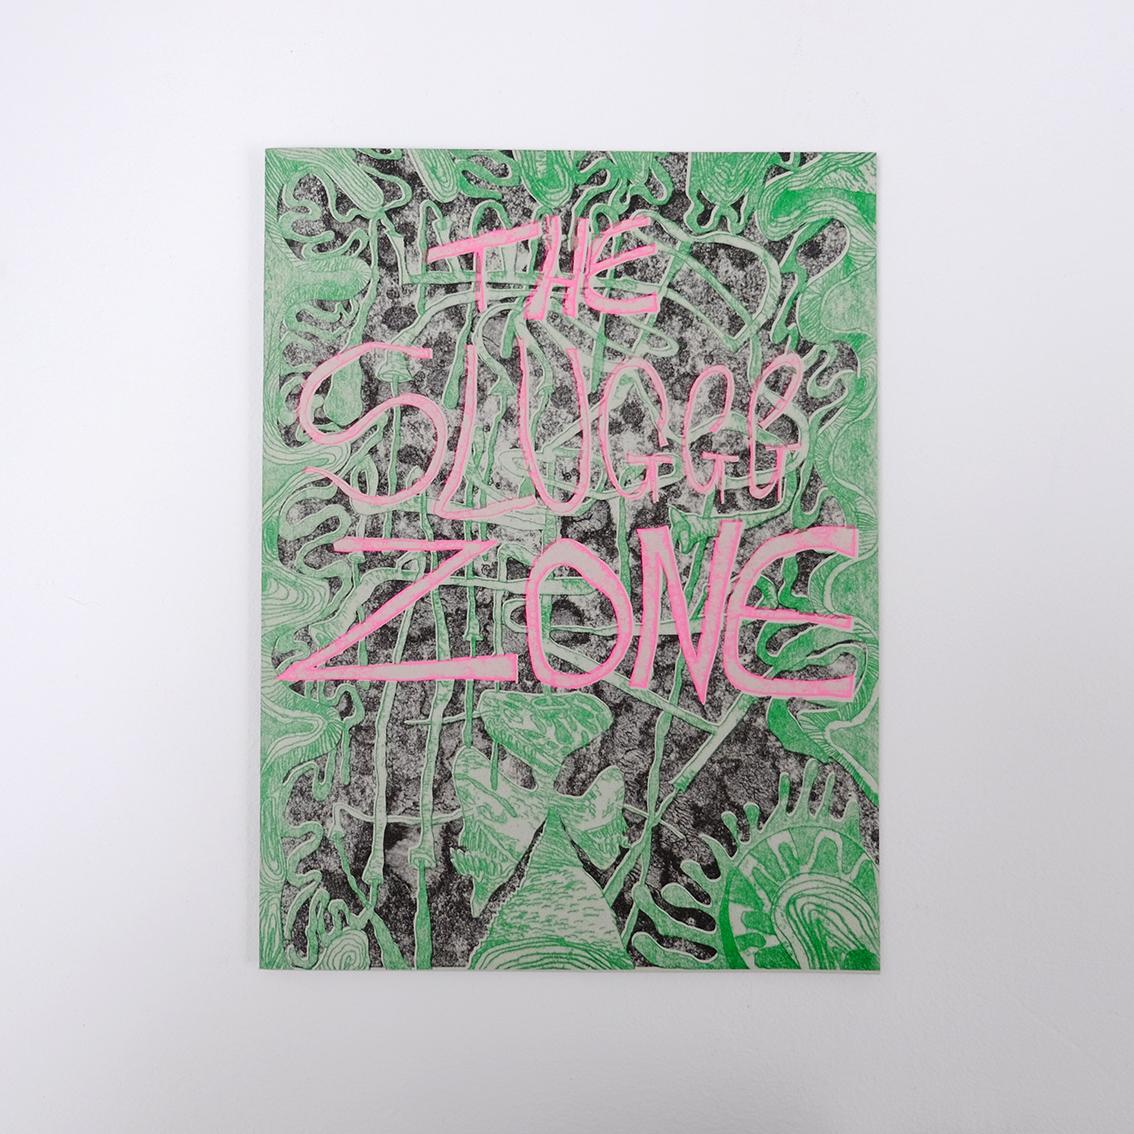 Sluggg Zone - Lord ZOM